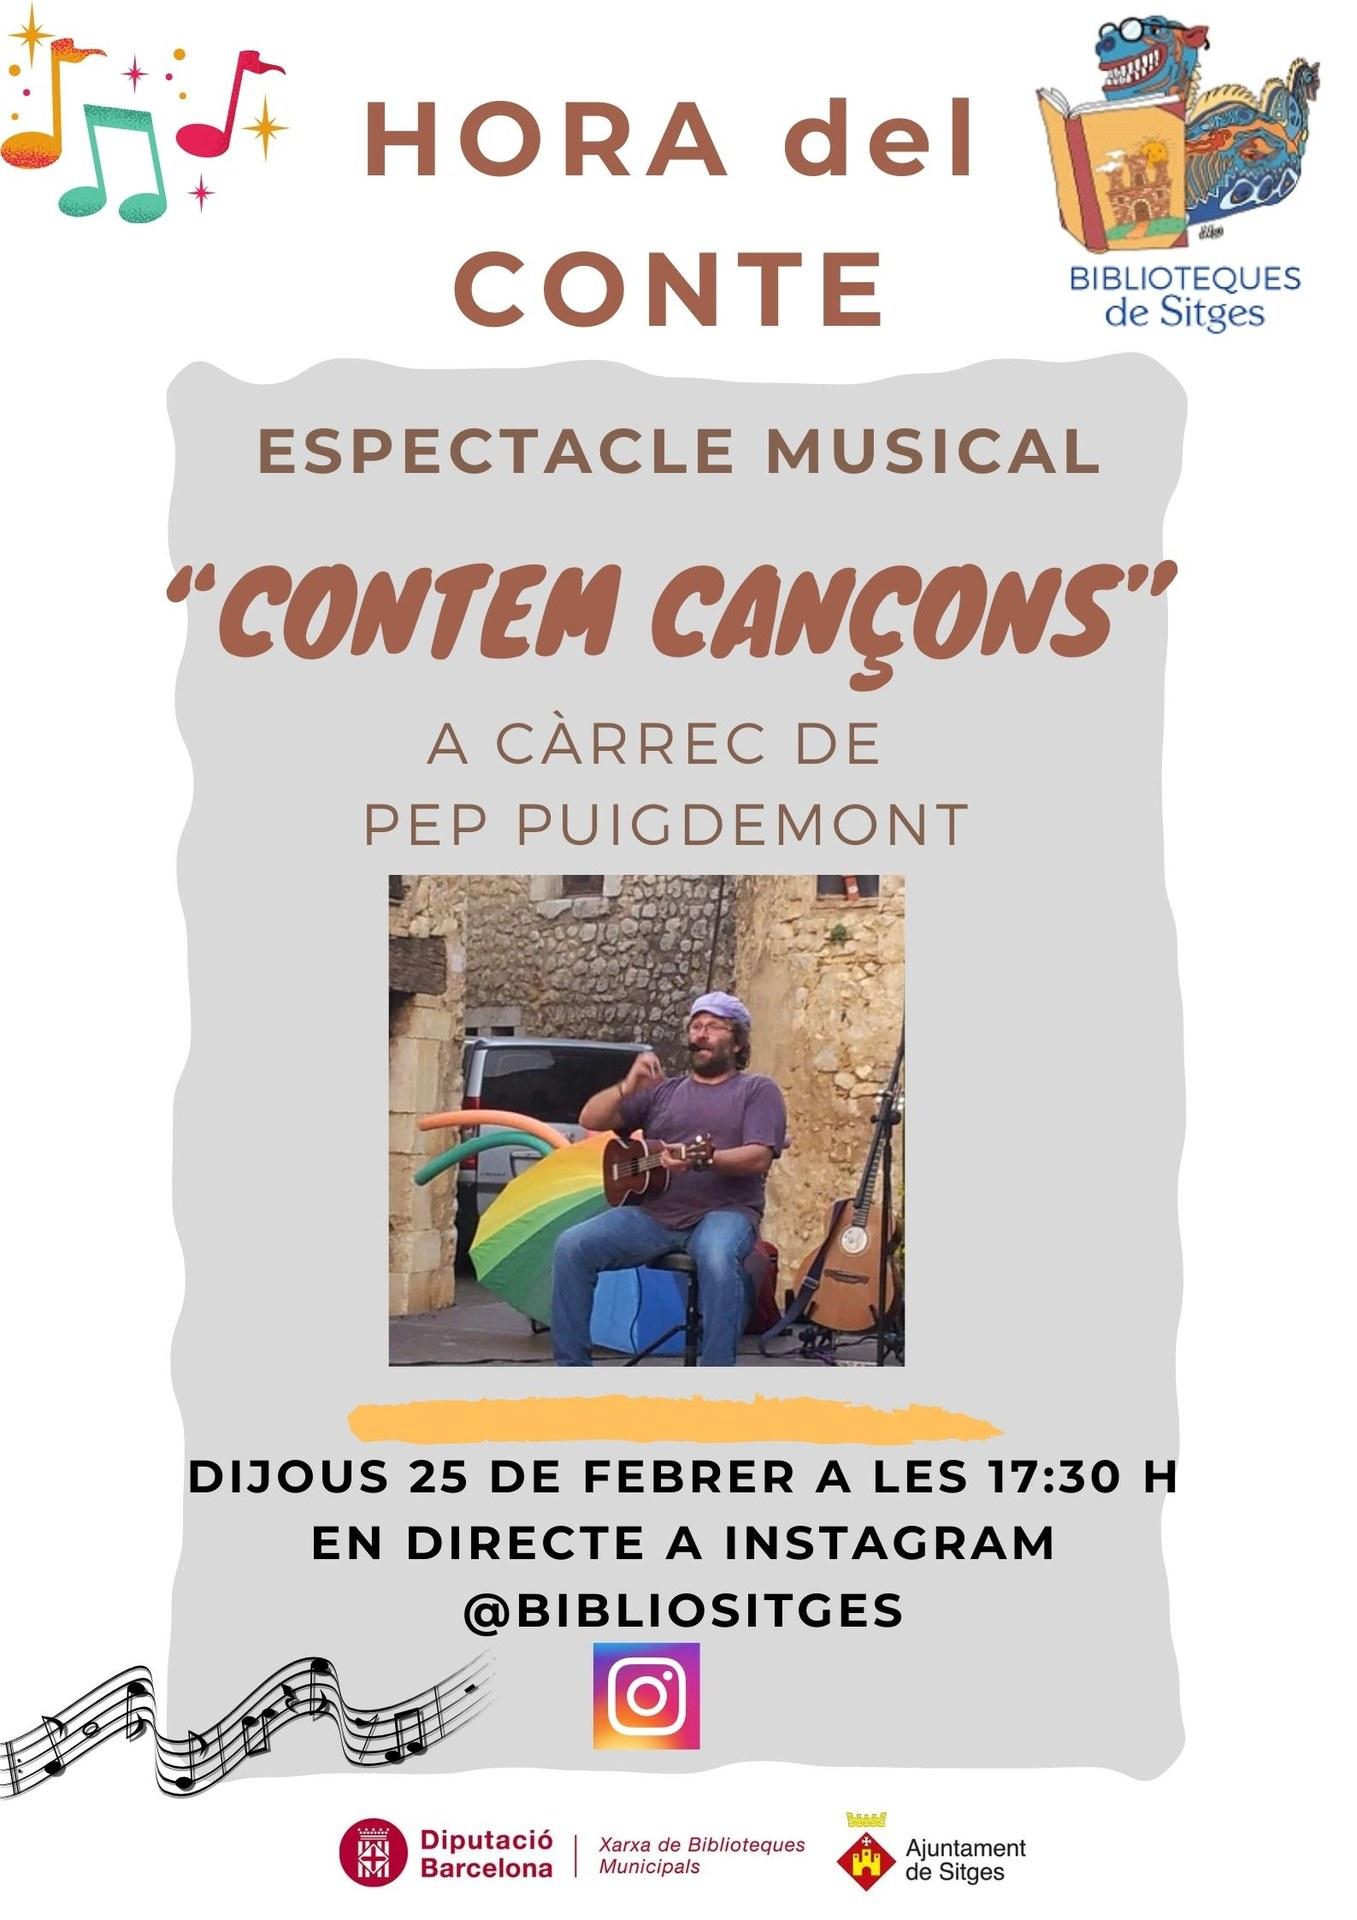 Hora del Conte. Espectacle musical 'Cantem cançons', a càrrec de Pep Puigdemont -En directe per Instagram @bibliositges-